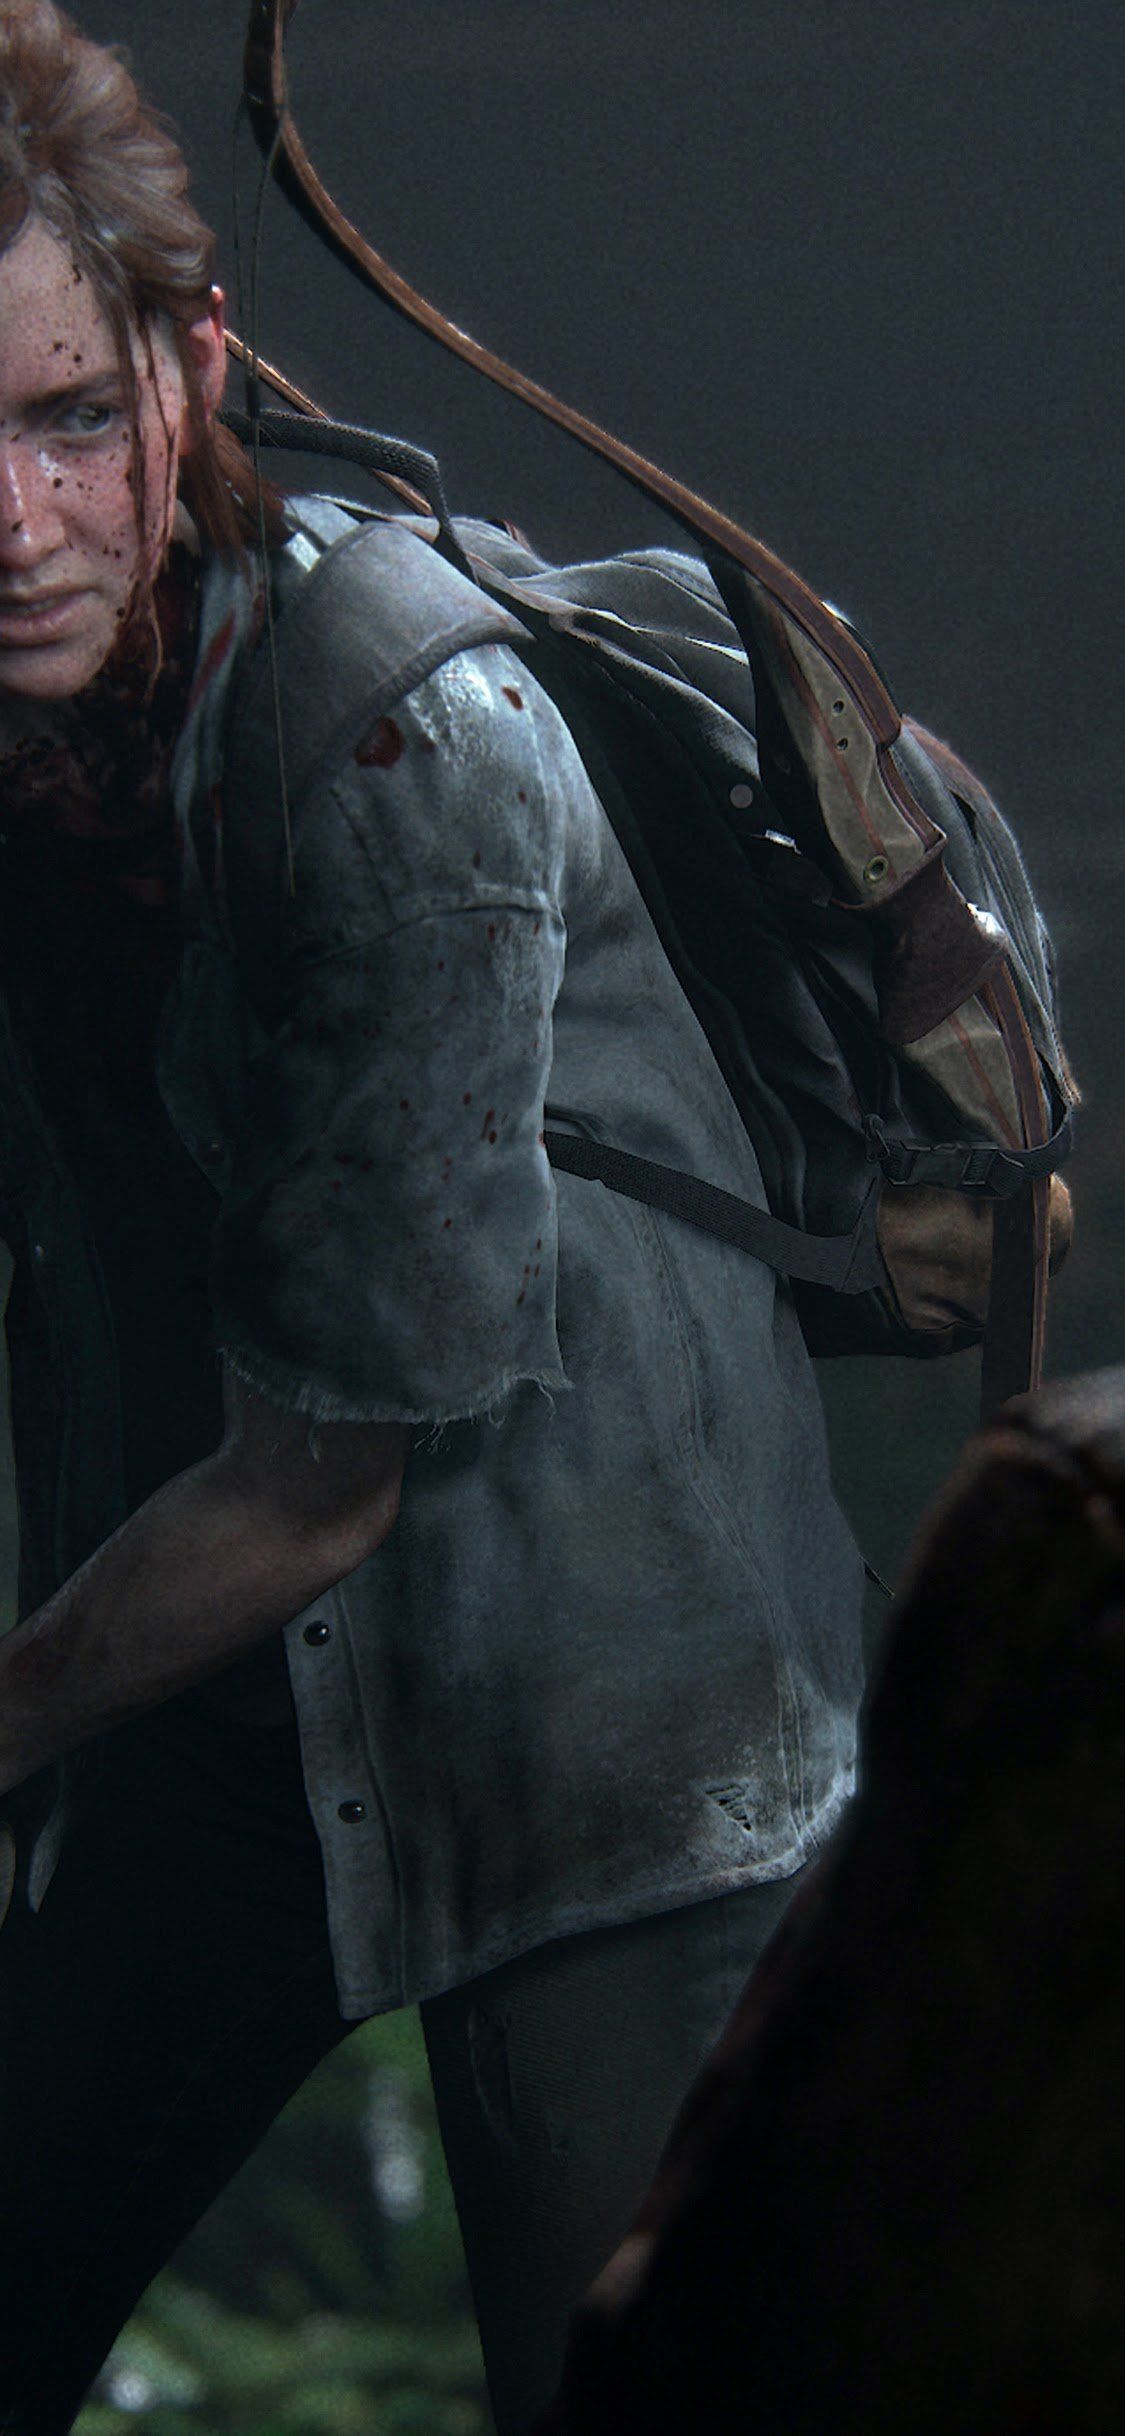 The Last of Us Part 2 Ellie 4K Wallpaper 5 1125x2436